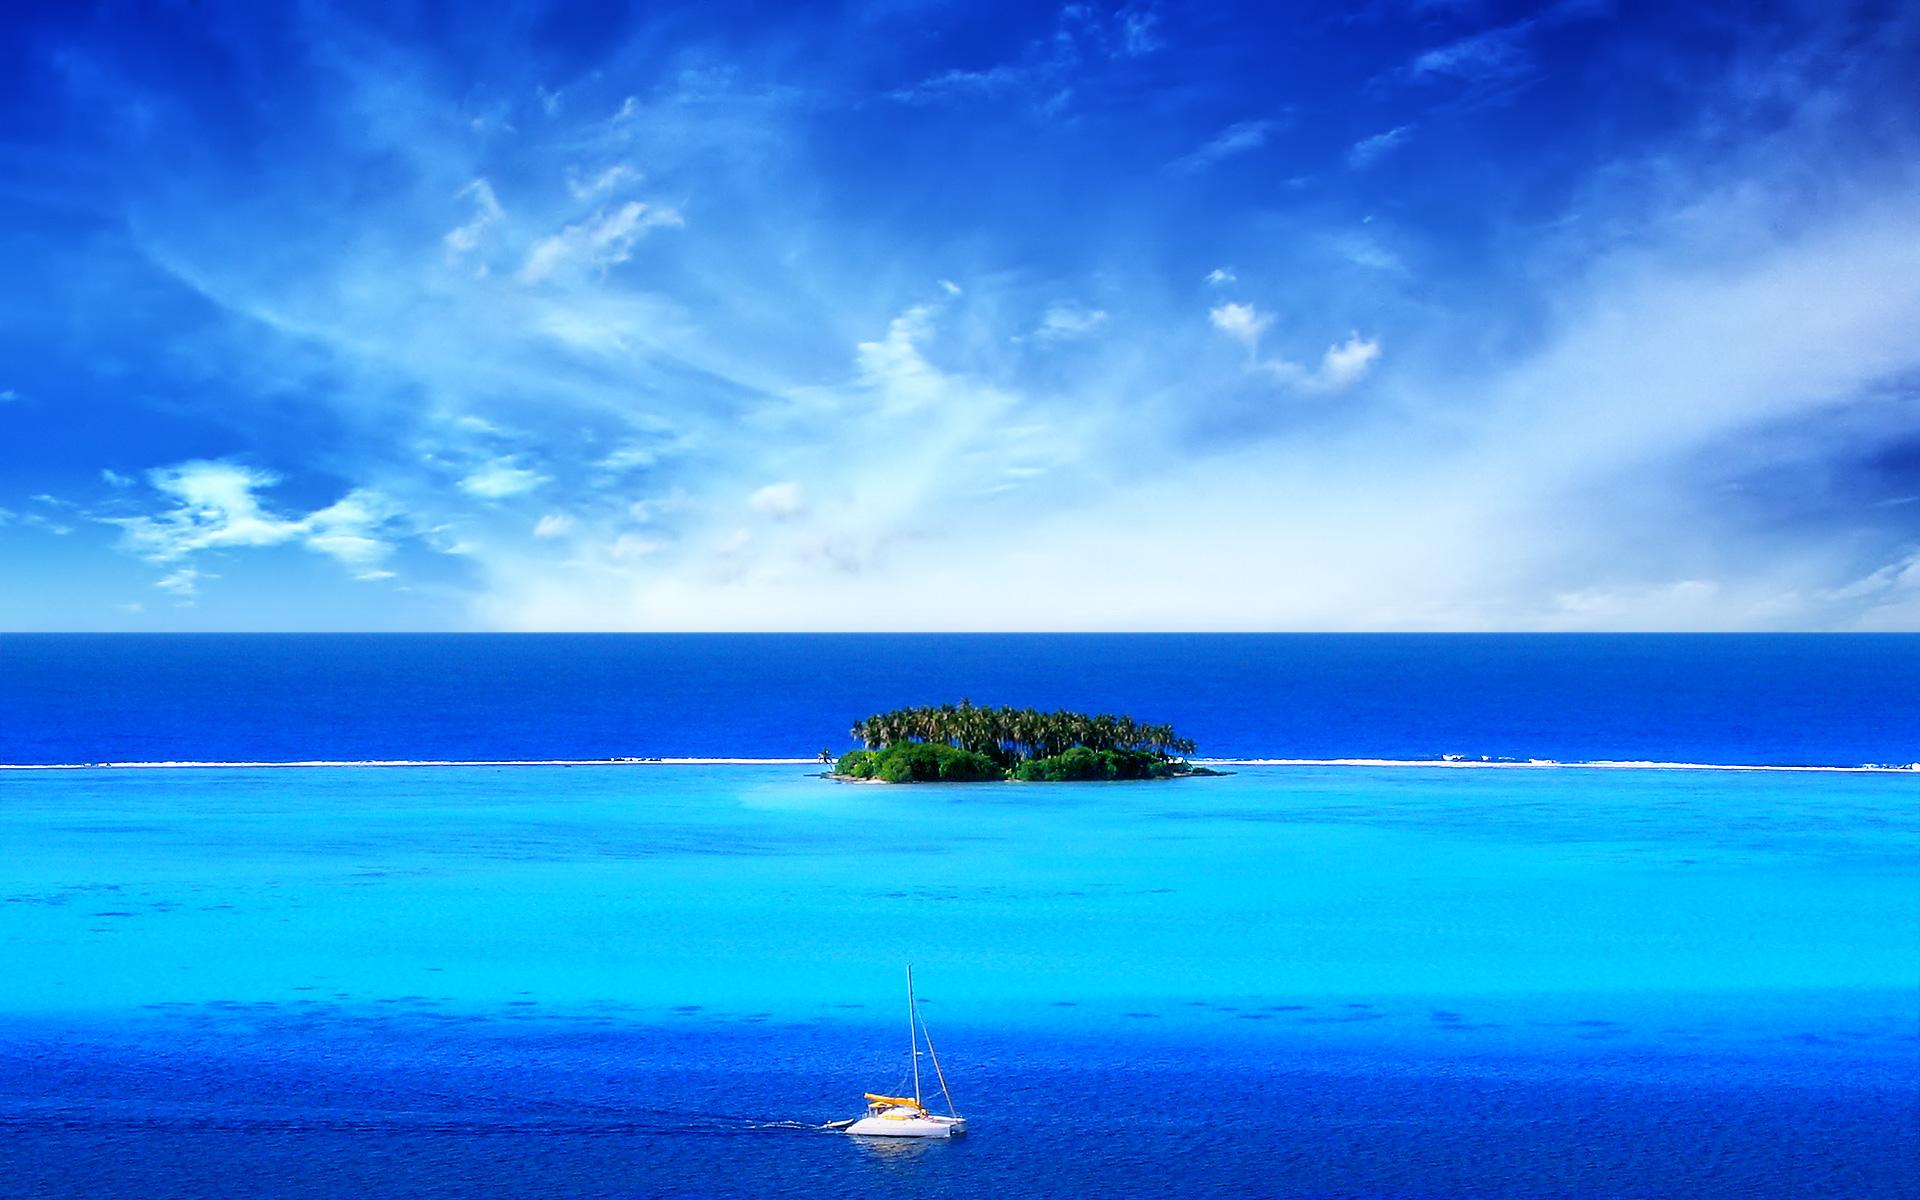 Sfondi desktop paesaggi HD - isola nell'oceano